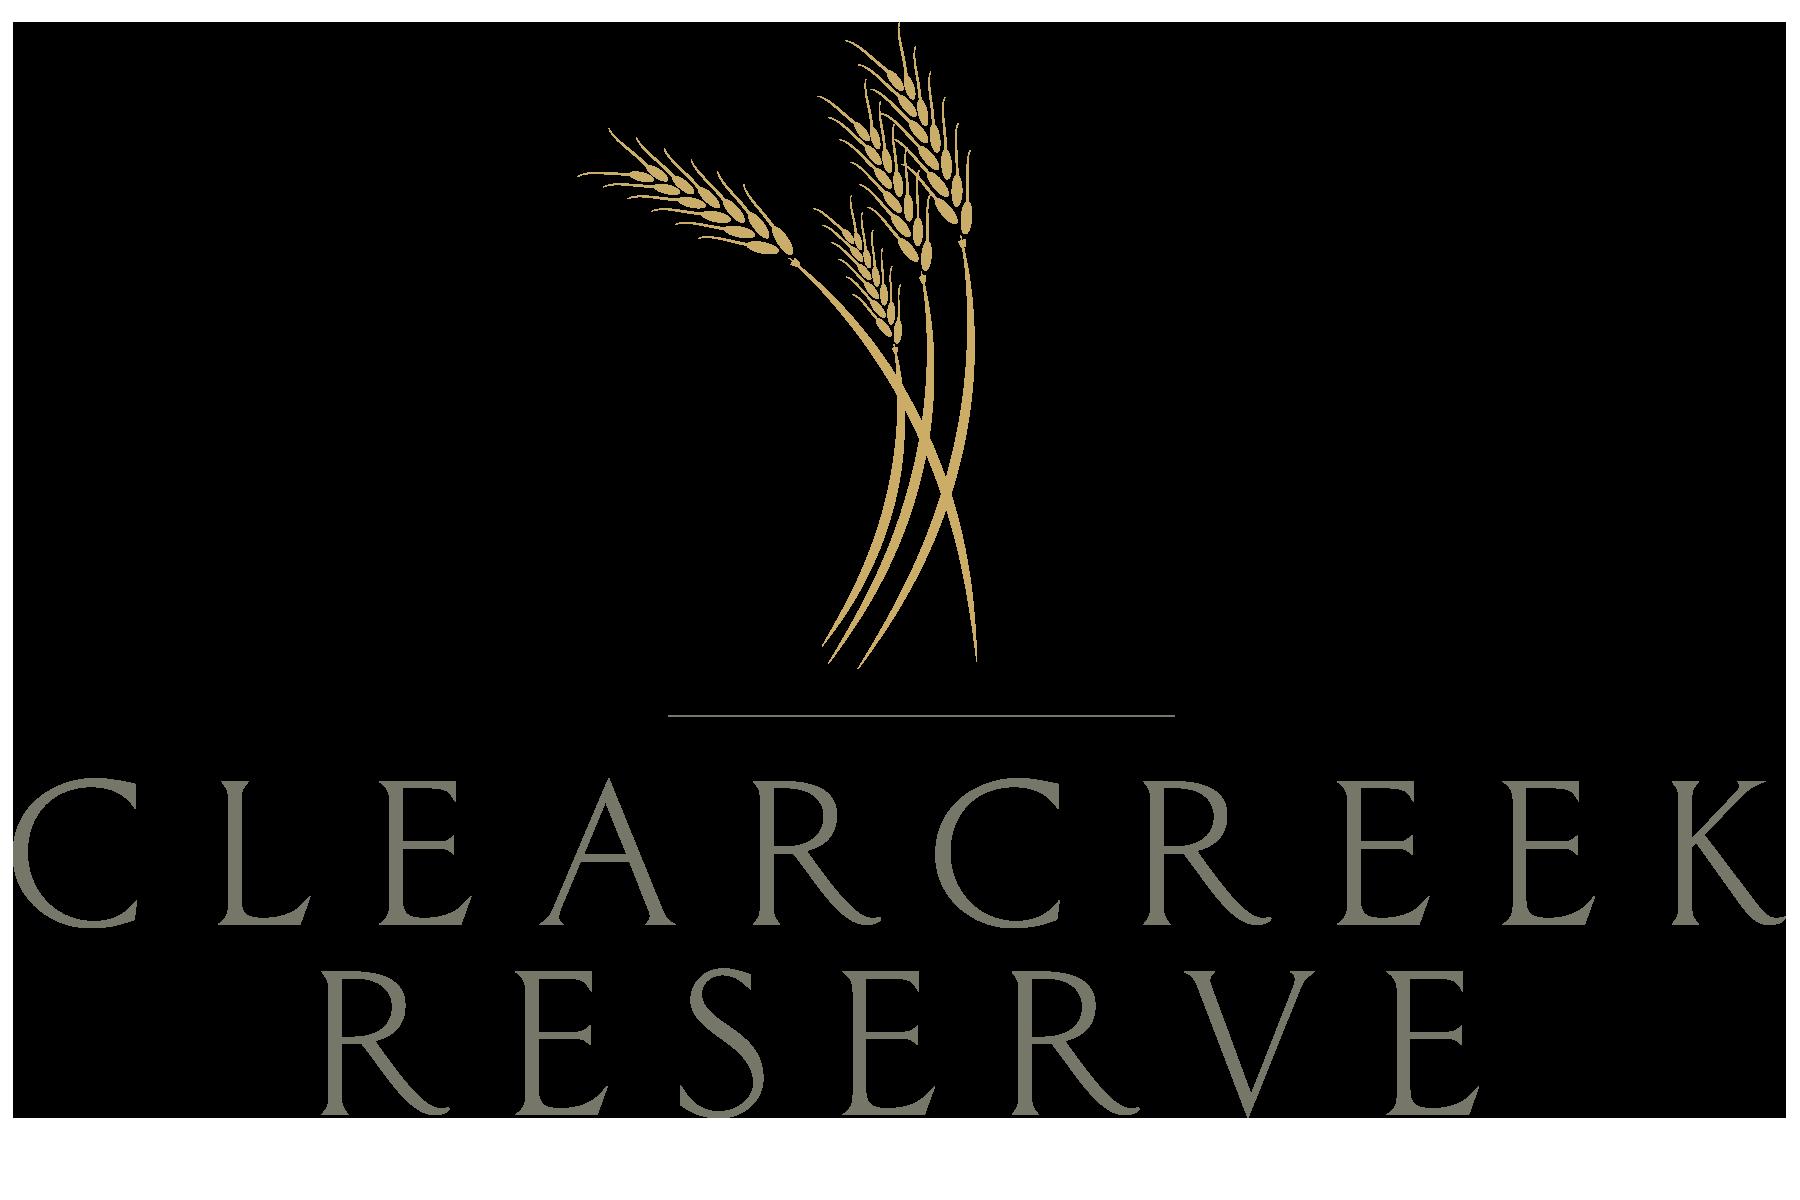 ClearcreekReserve_logo_FINAL.png